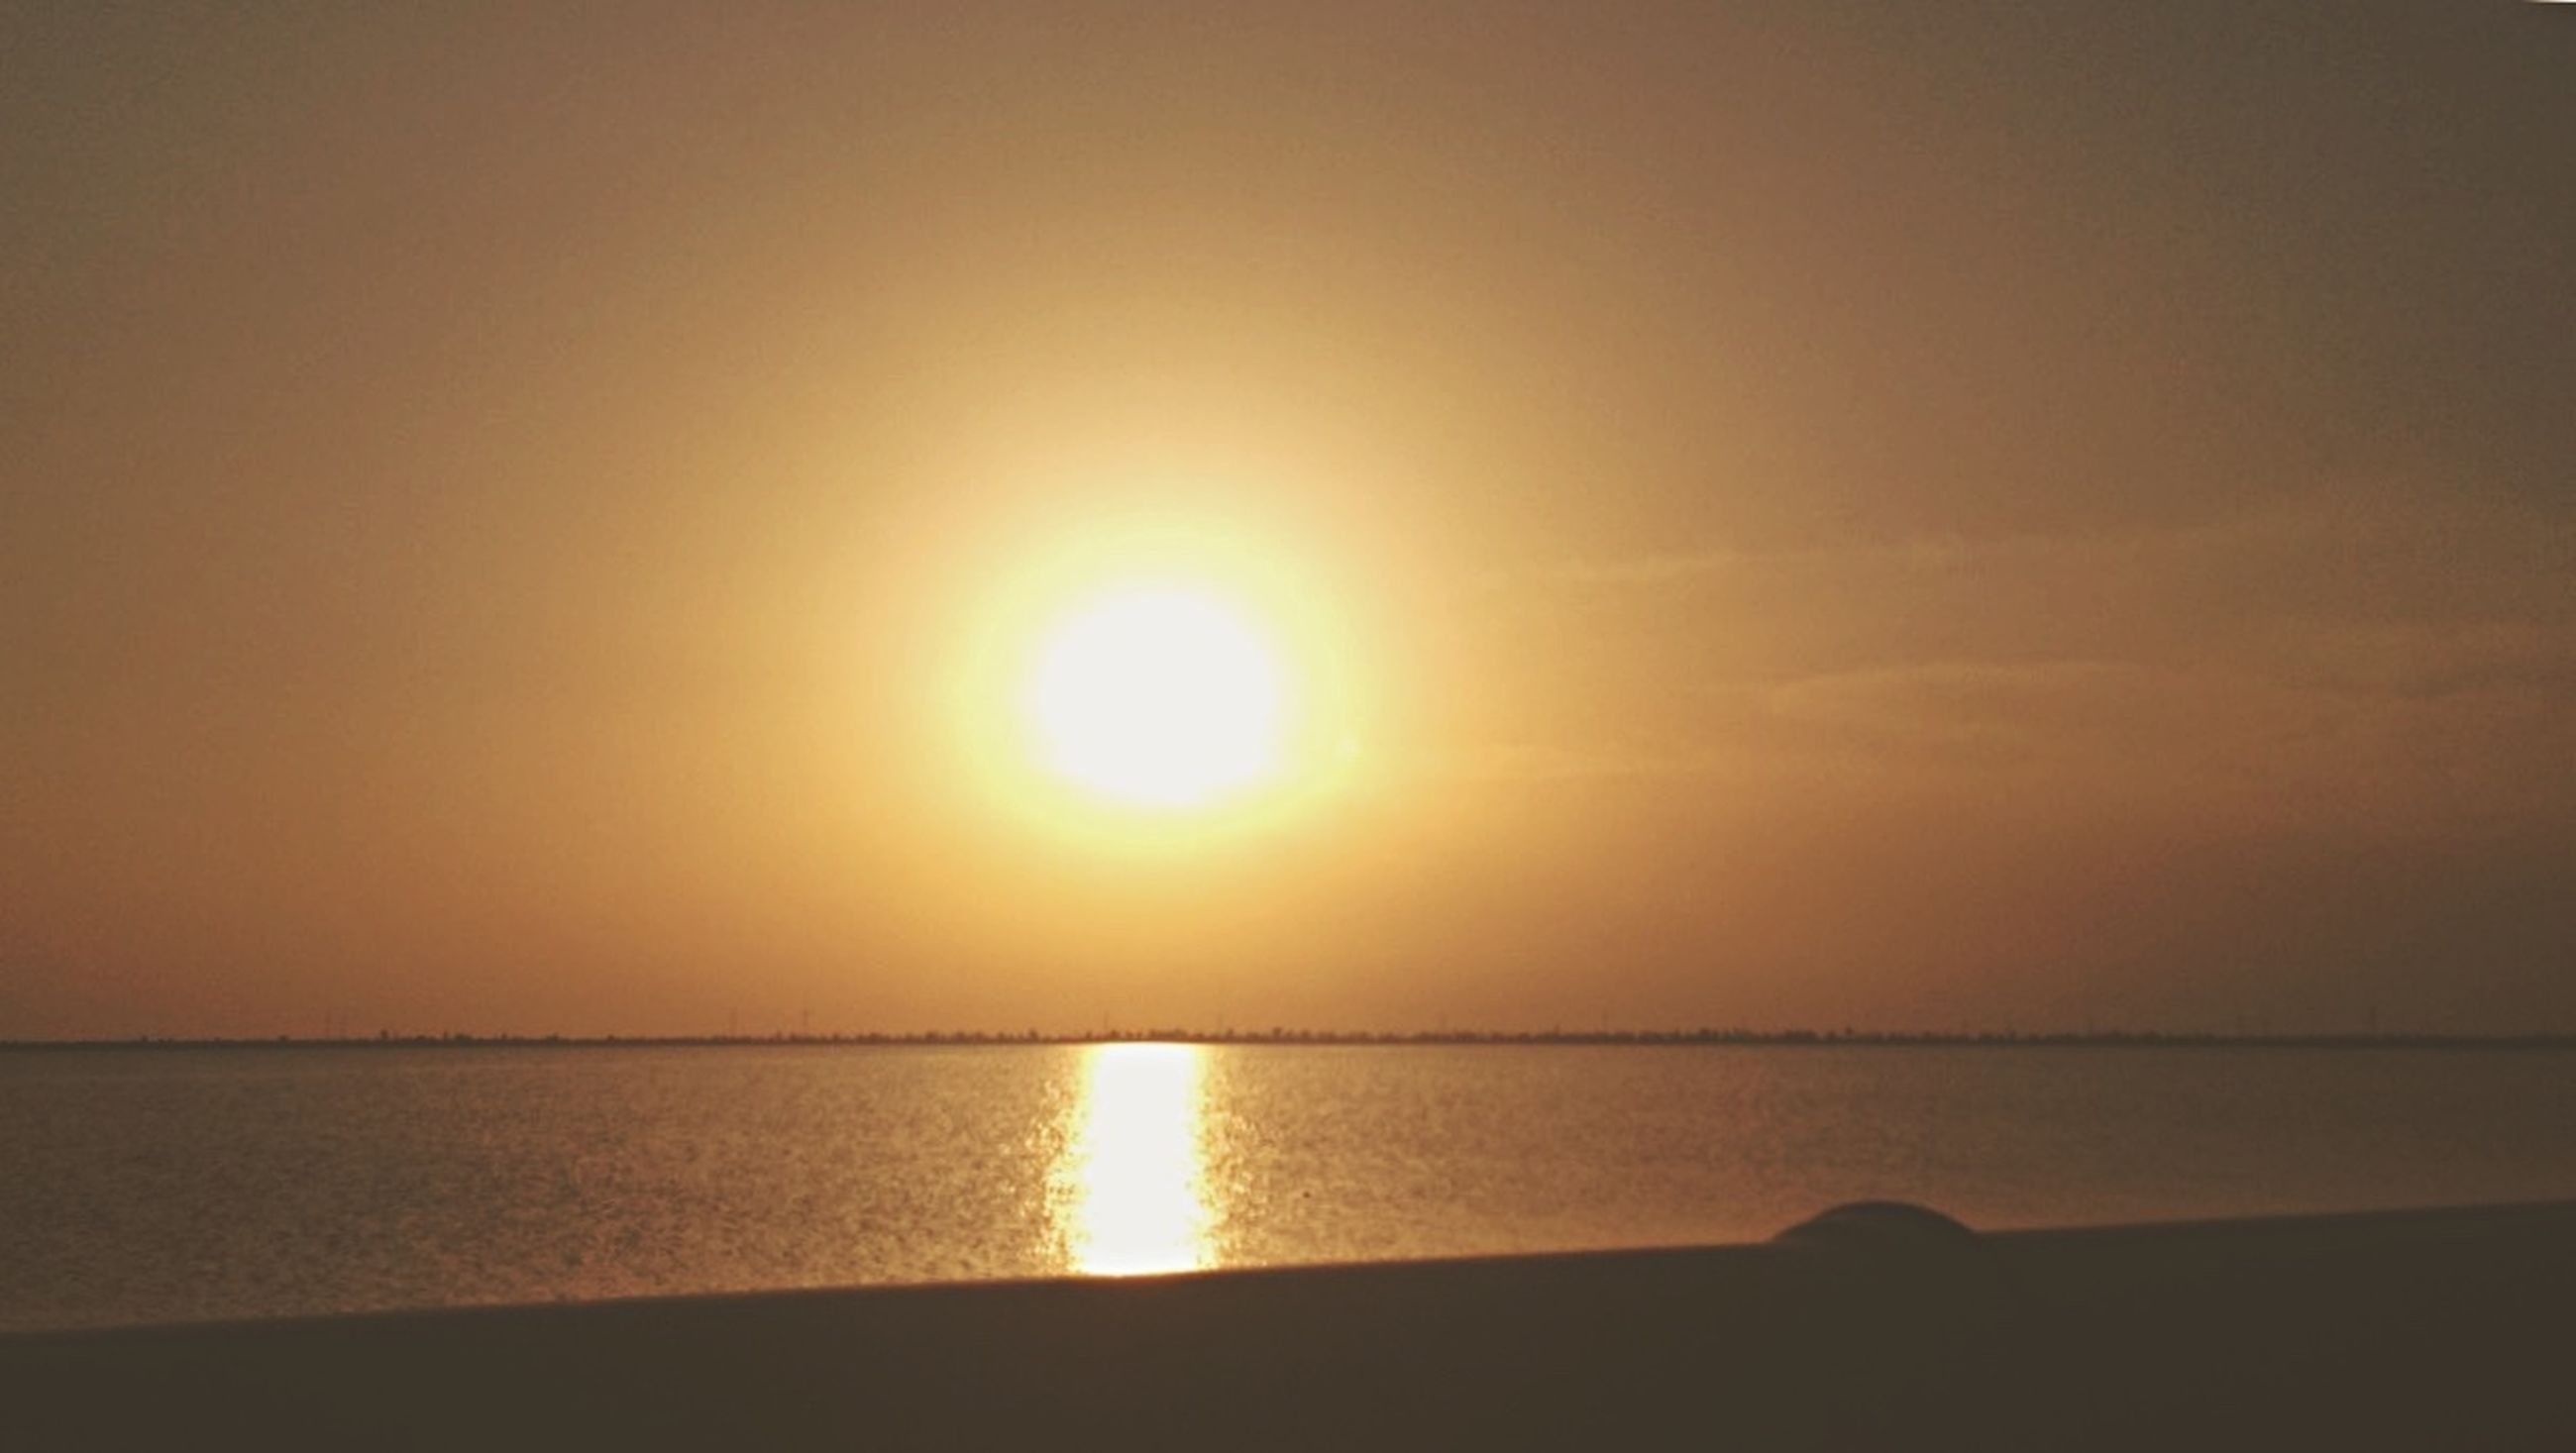 sun, sunset, sea, scenics, beauty in nature, nature, water, tranquil scene, tranquility, reflection, idyllic, silhouette, sunlight, bright, sky, horizon over water, beach, no people, horizon, outdoors